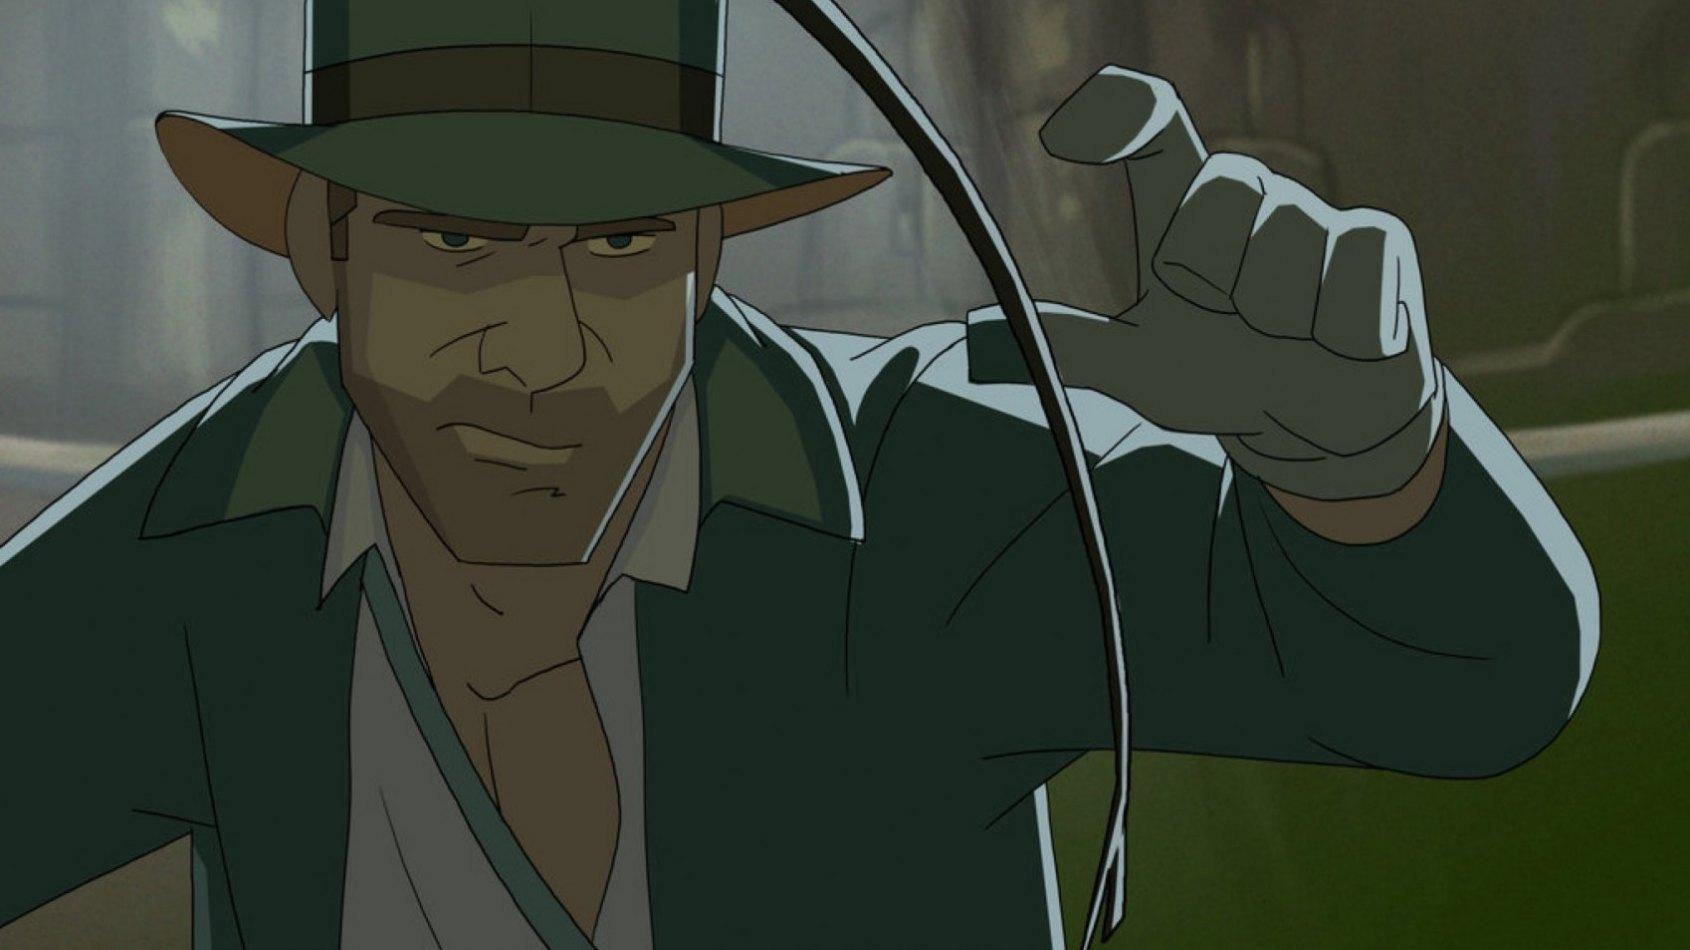 Des images du film d'animation Indiana Jones